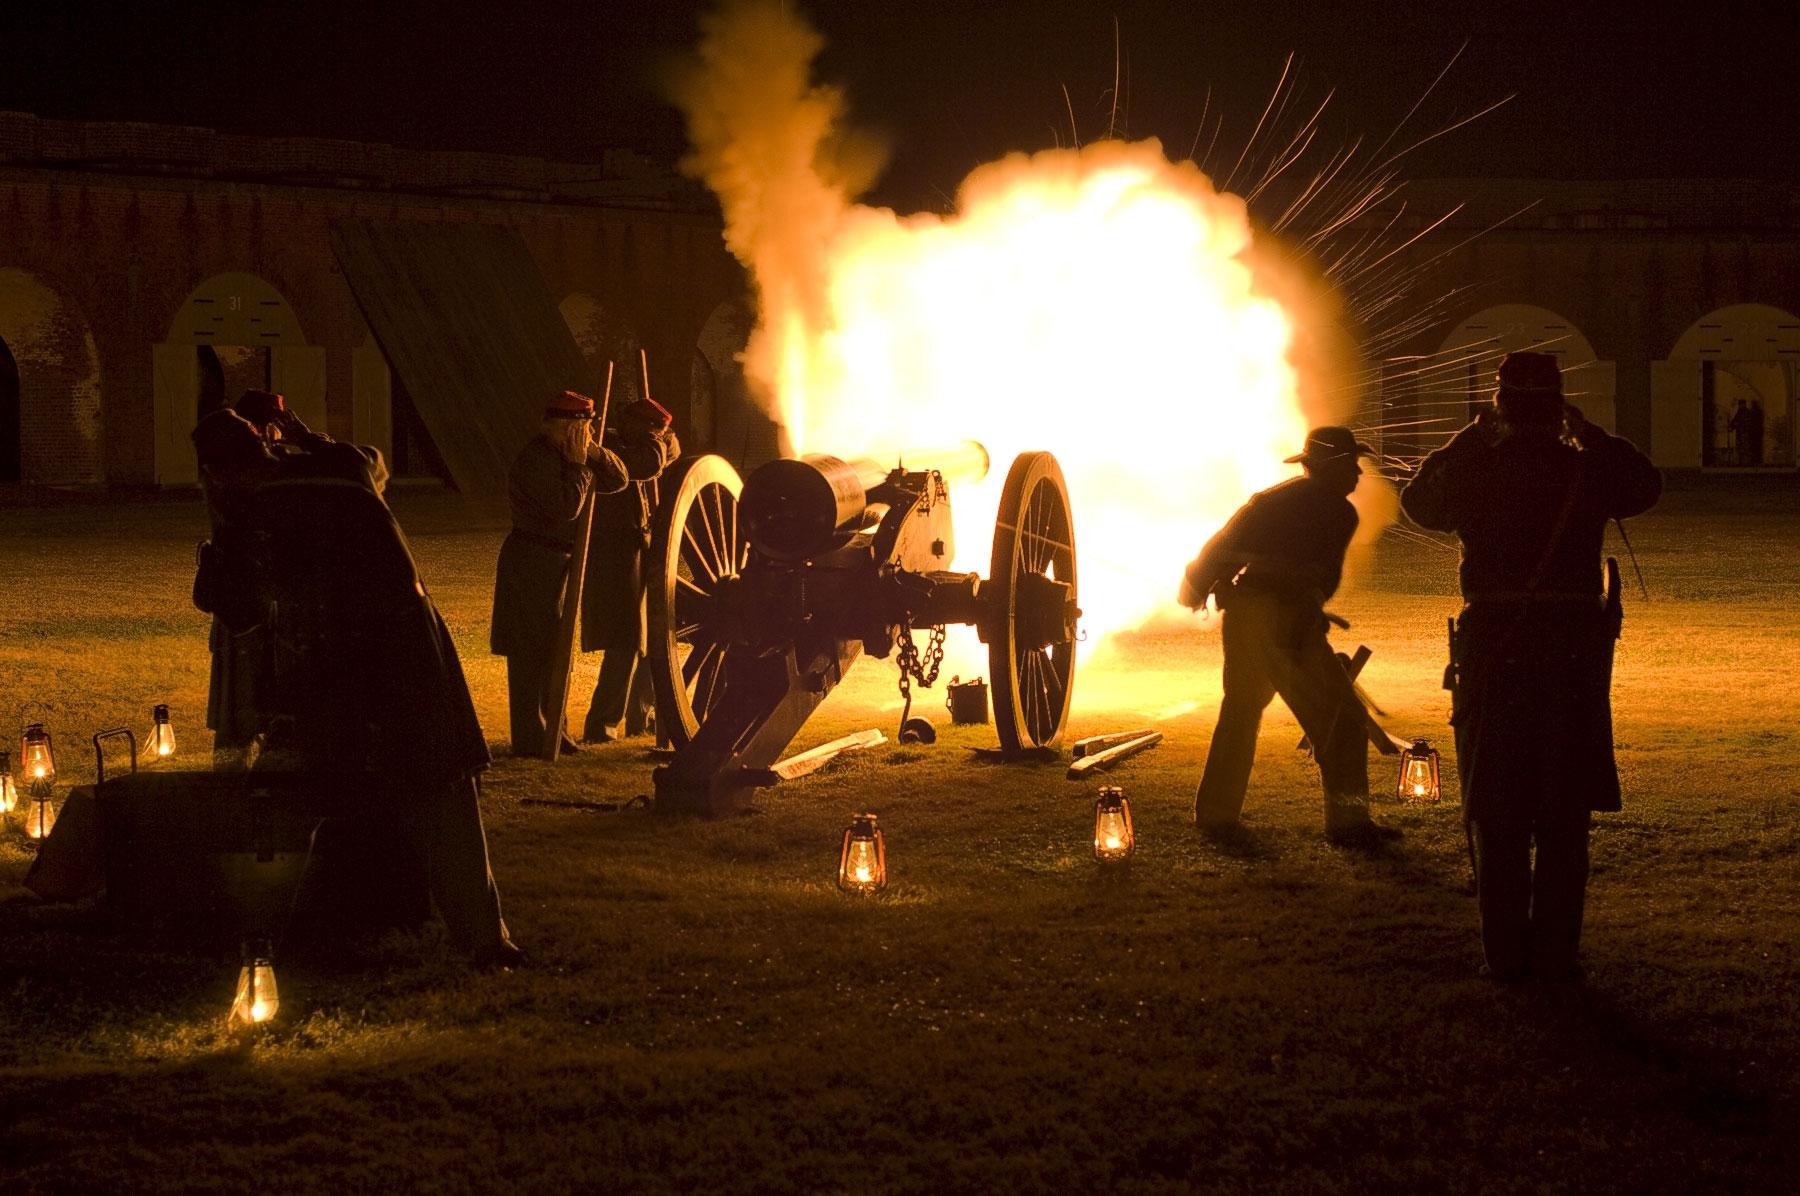 Civil war cannon firing